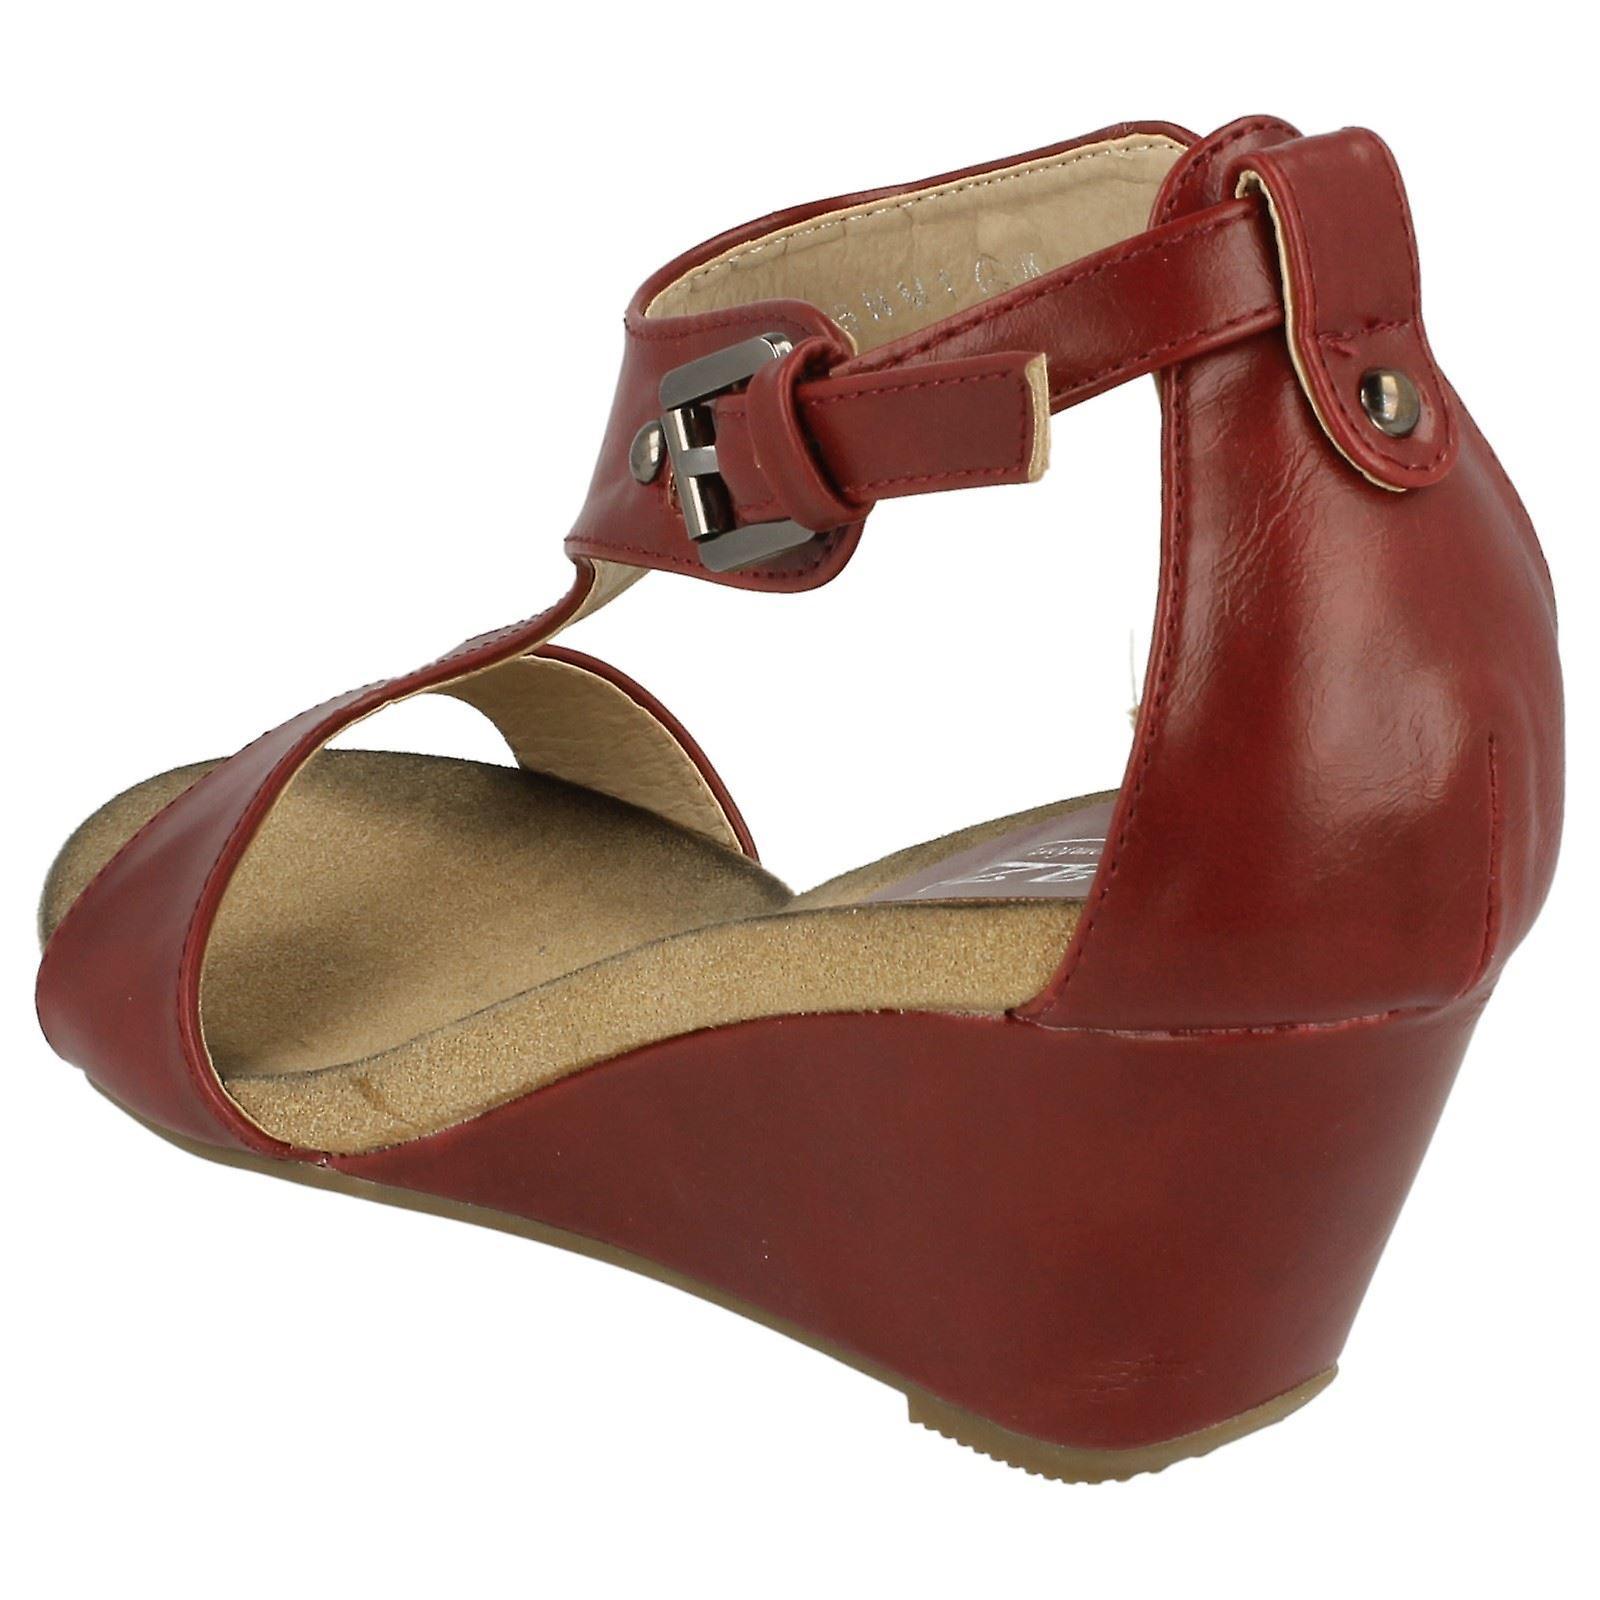 Ladies Eaze Open Toe T-bar Wedge Mules